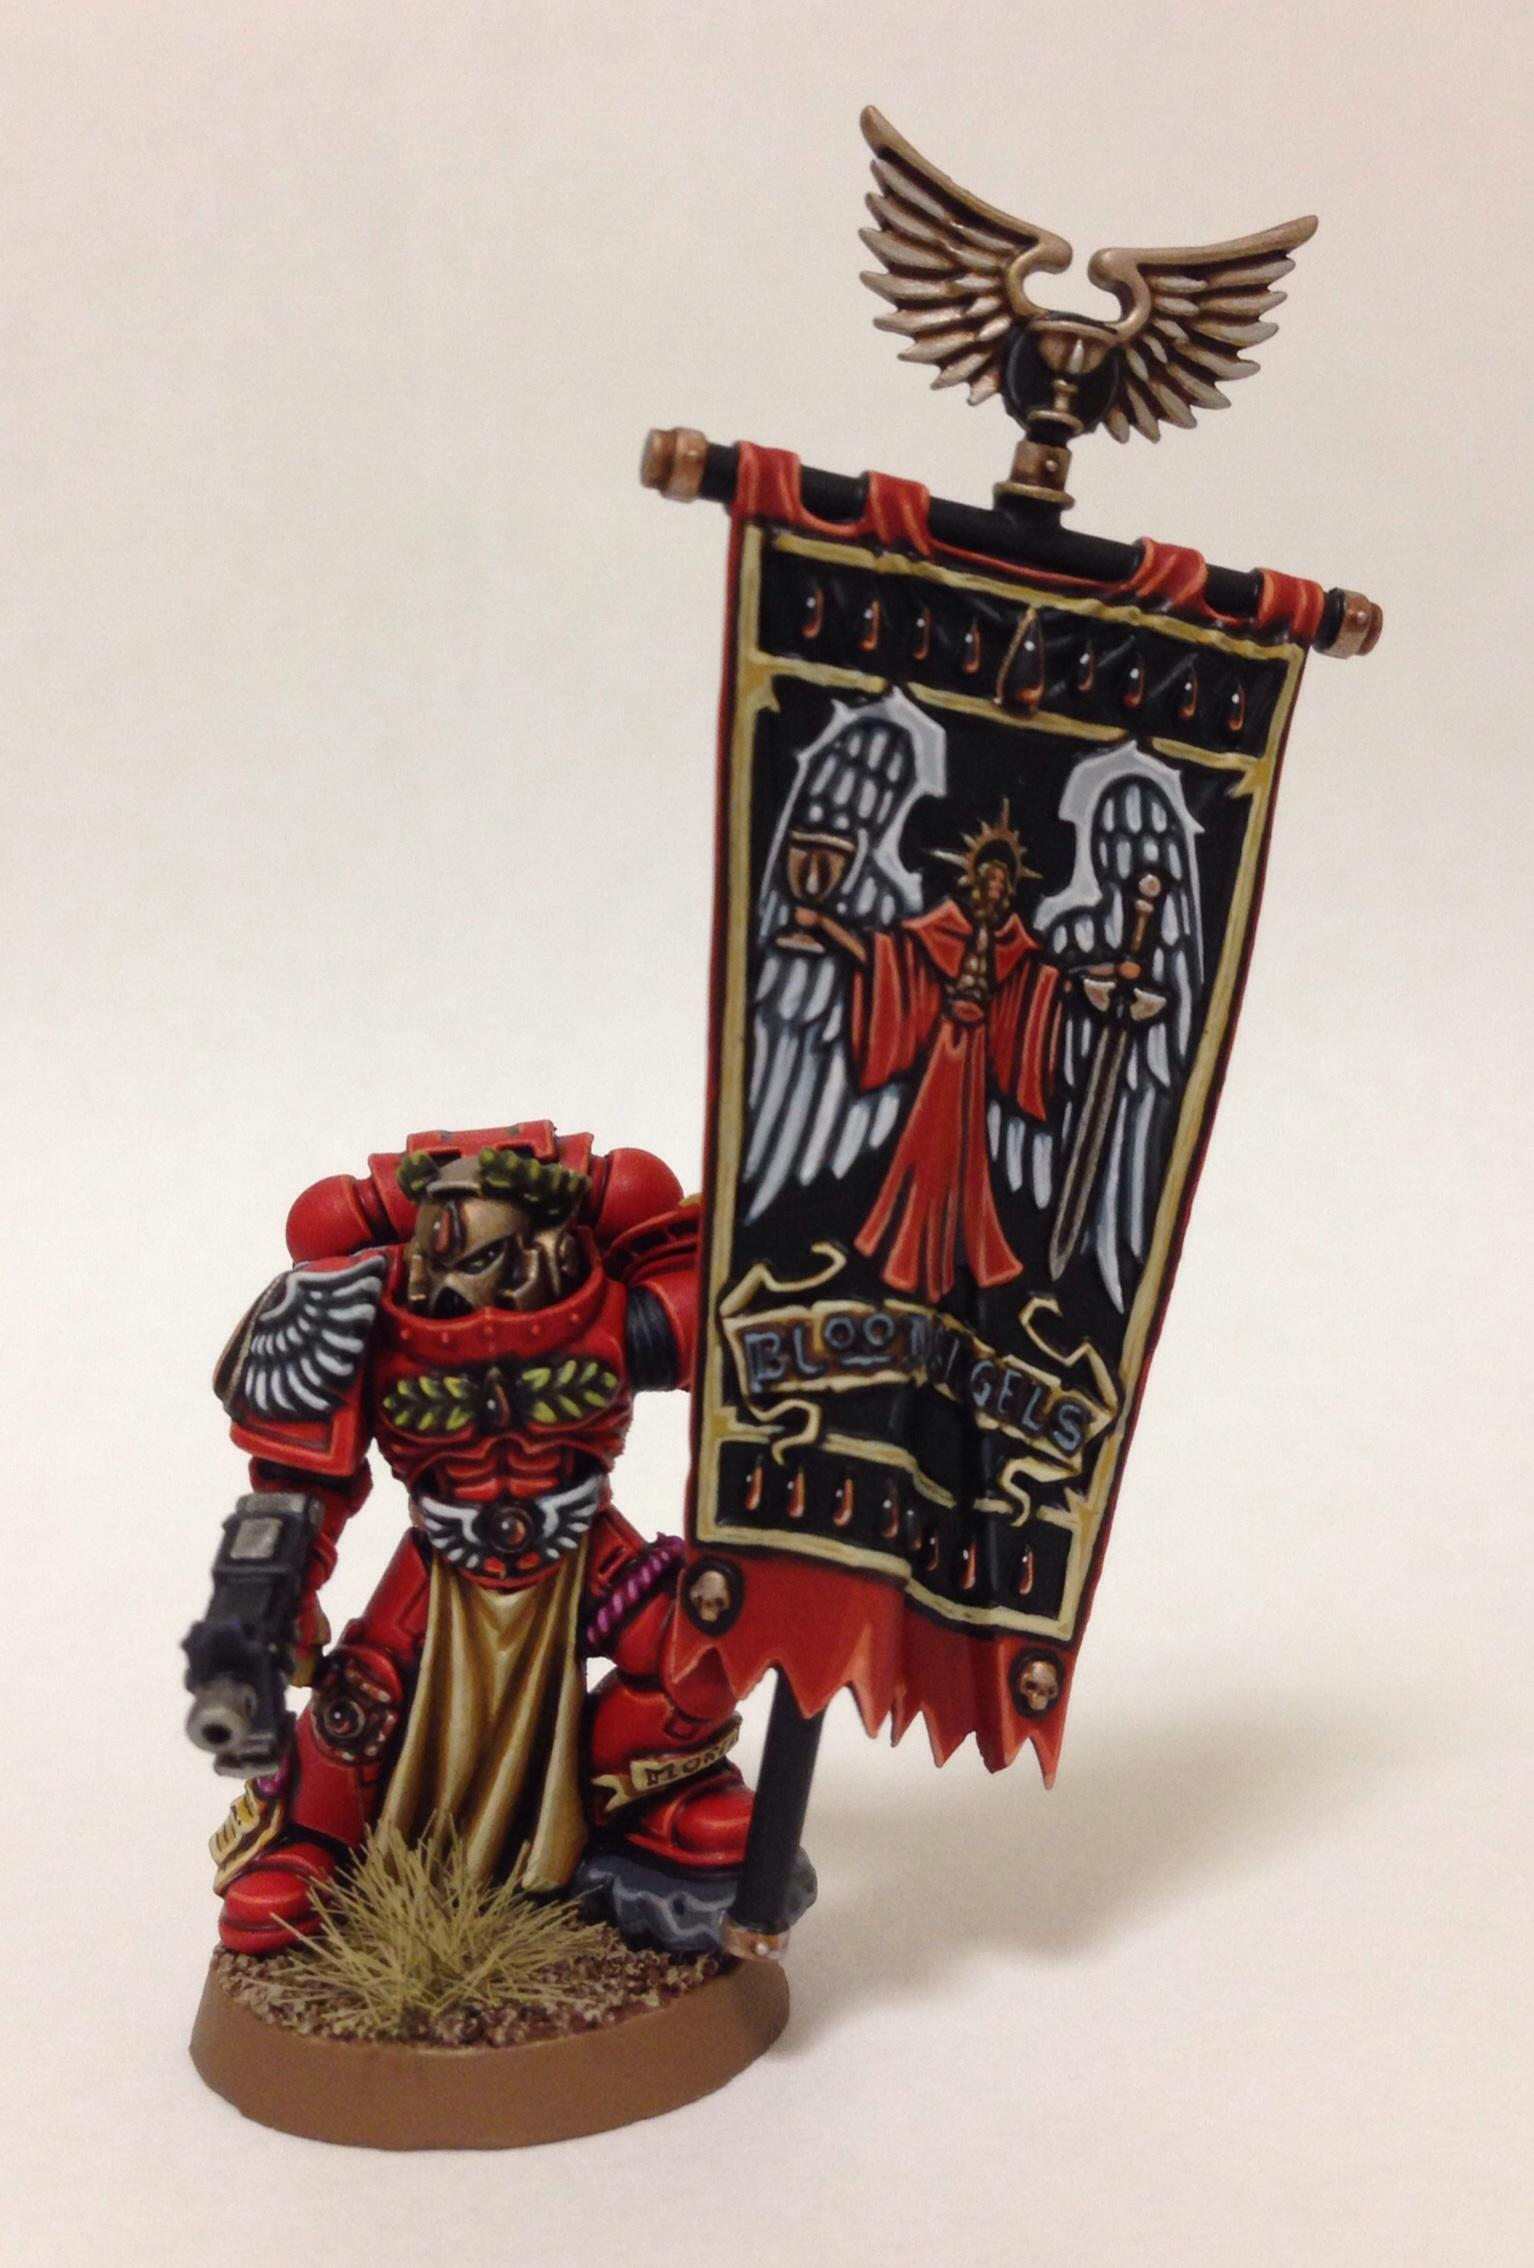 Blood Angels, Blood Angels Standard, Honor Guard, Standard, Warhammer 40,000